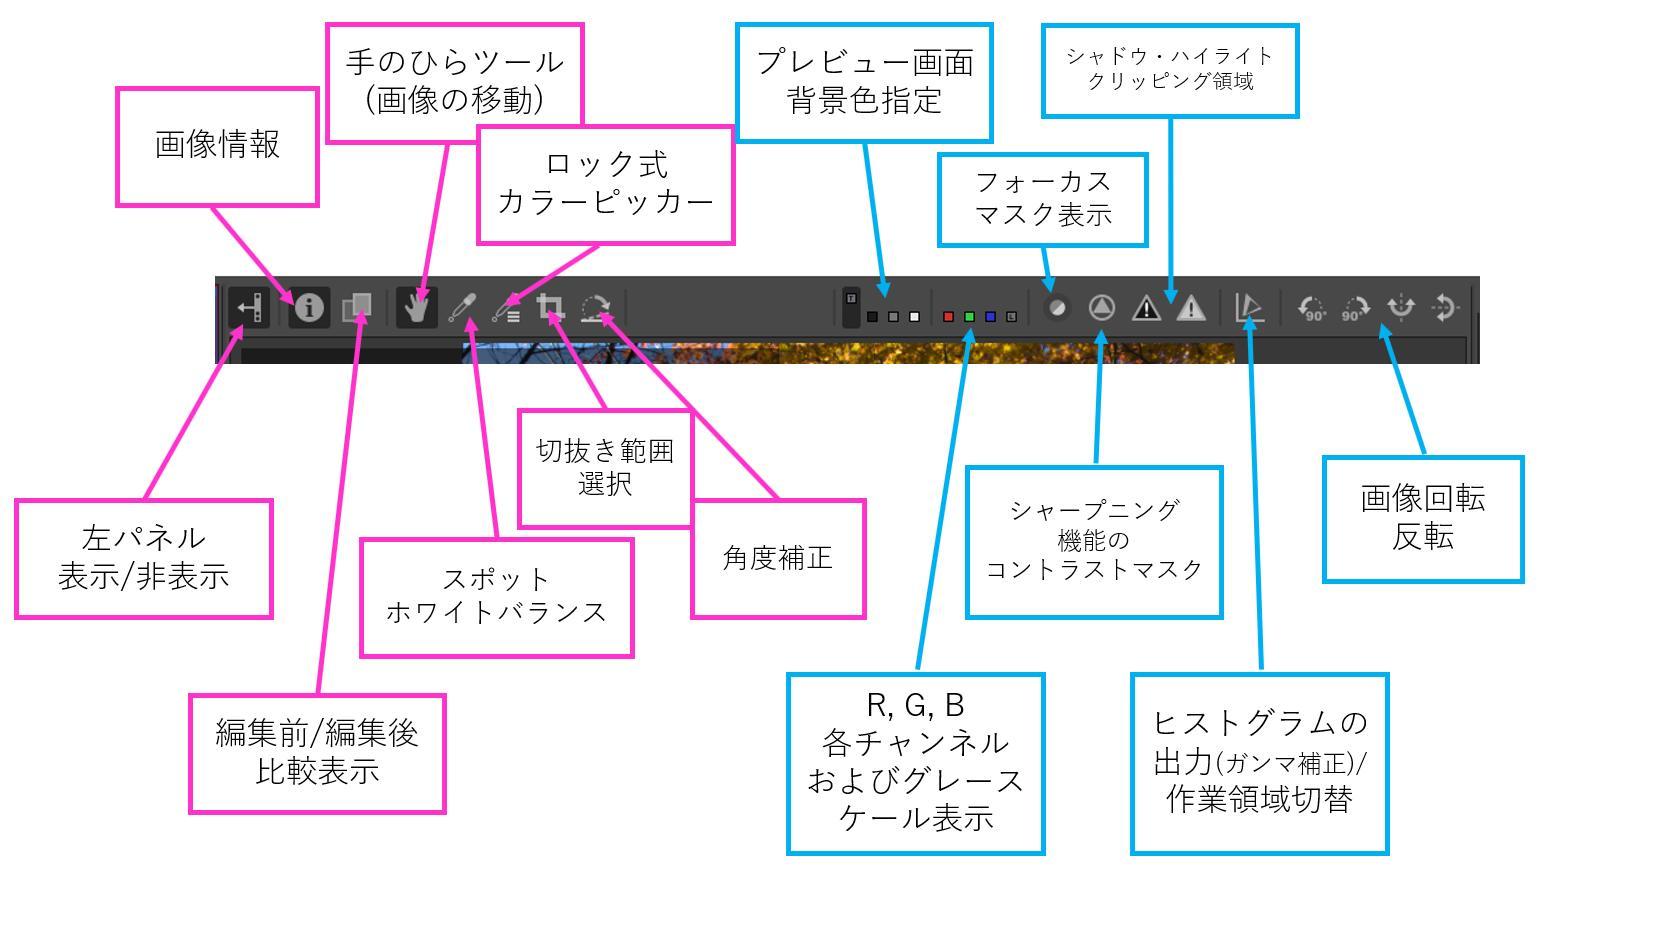 f:id:yasuo_ssi:20201206221507j:plain